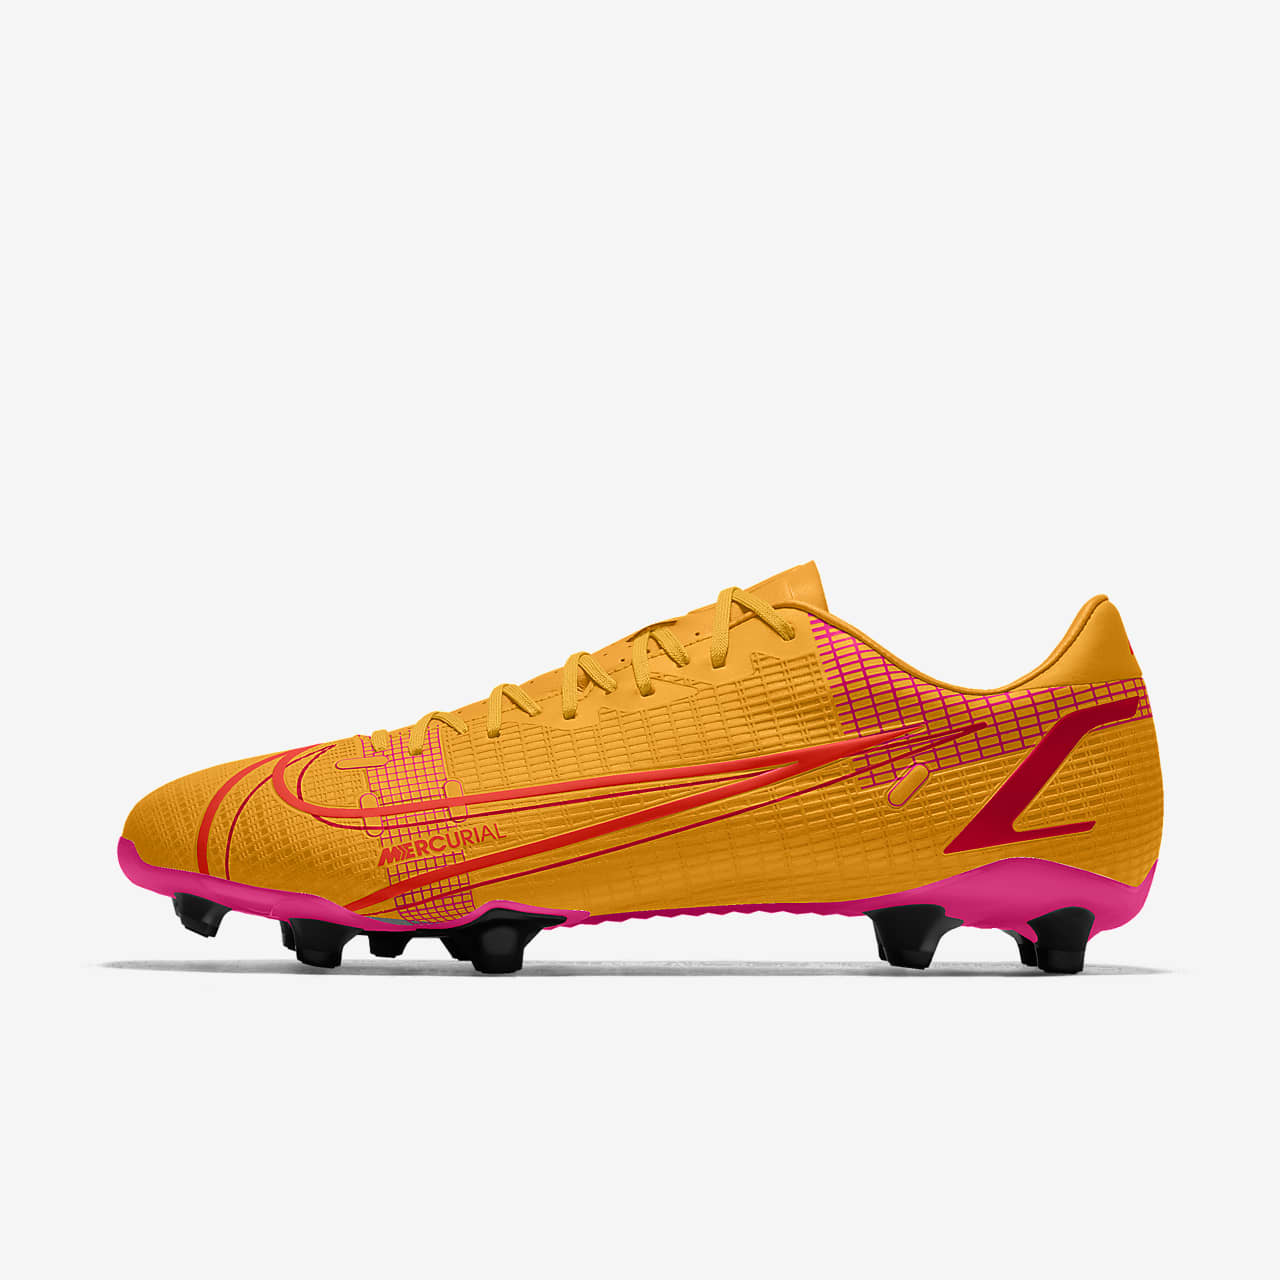 Nike Mercurial Vapor 14 Academy By You Custom Football Boot